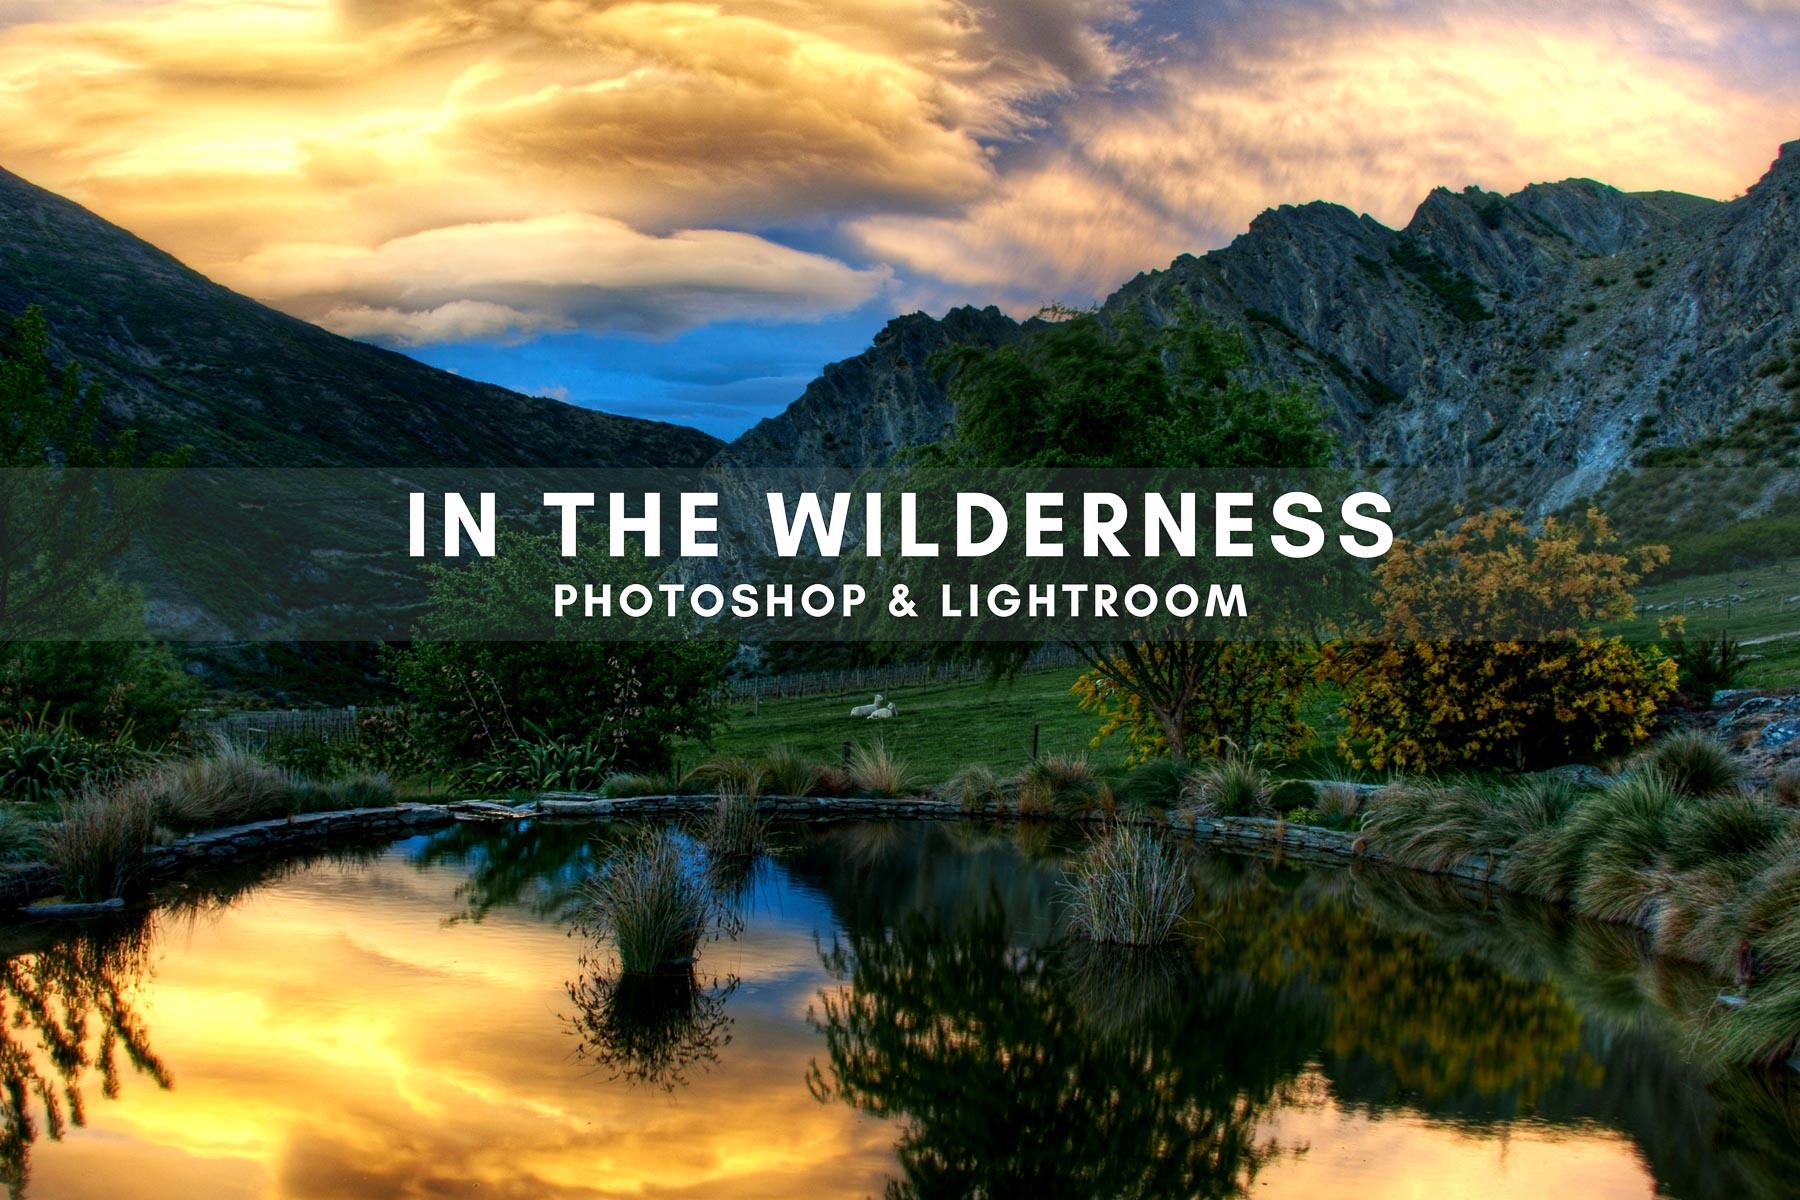 Lightroom & Photoshop XMP Landscape Presets